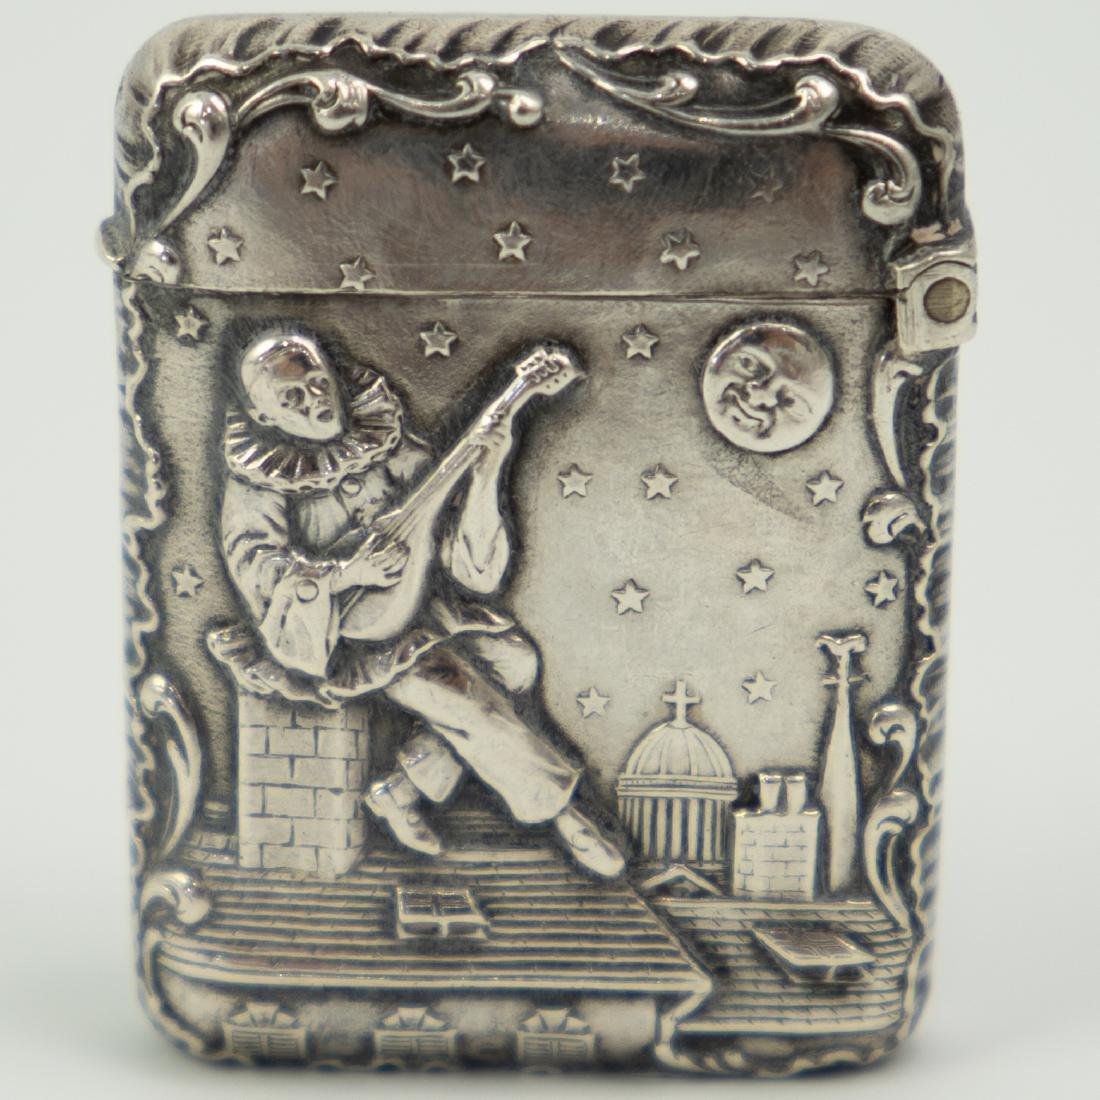 French Silver Match / Vesta Case